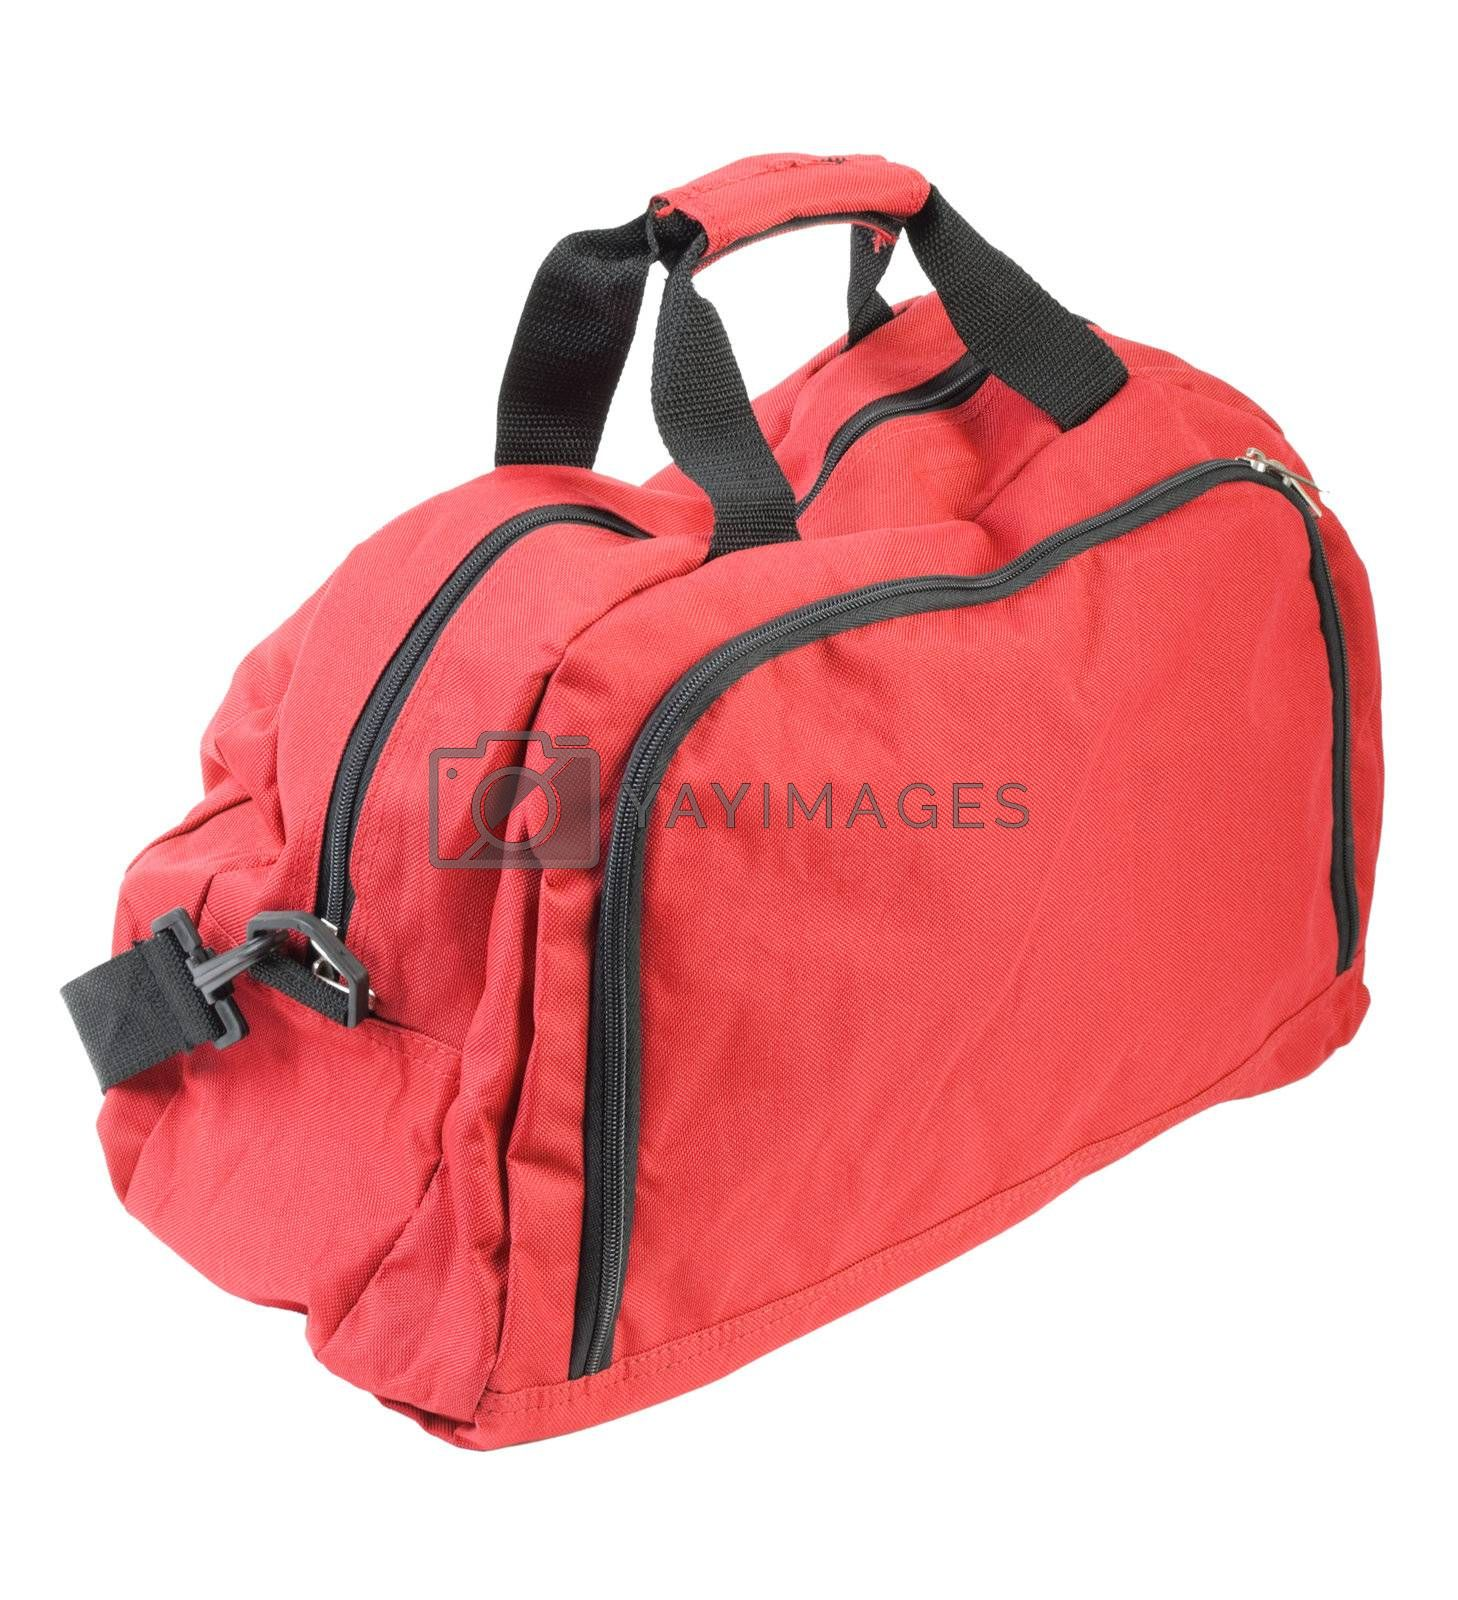 Royalty free image of Red luggage   Isolated by zakaz